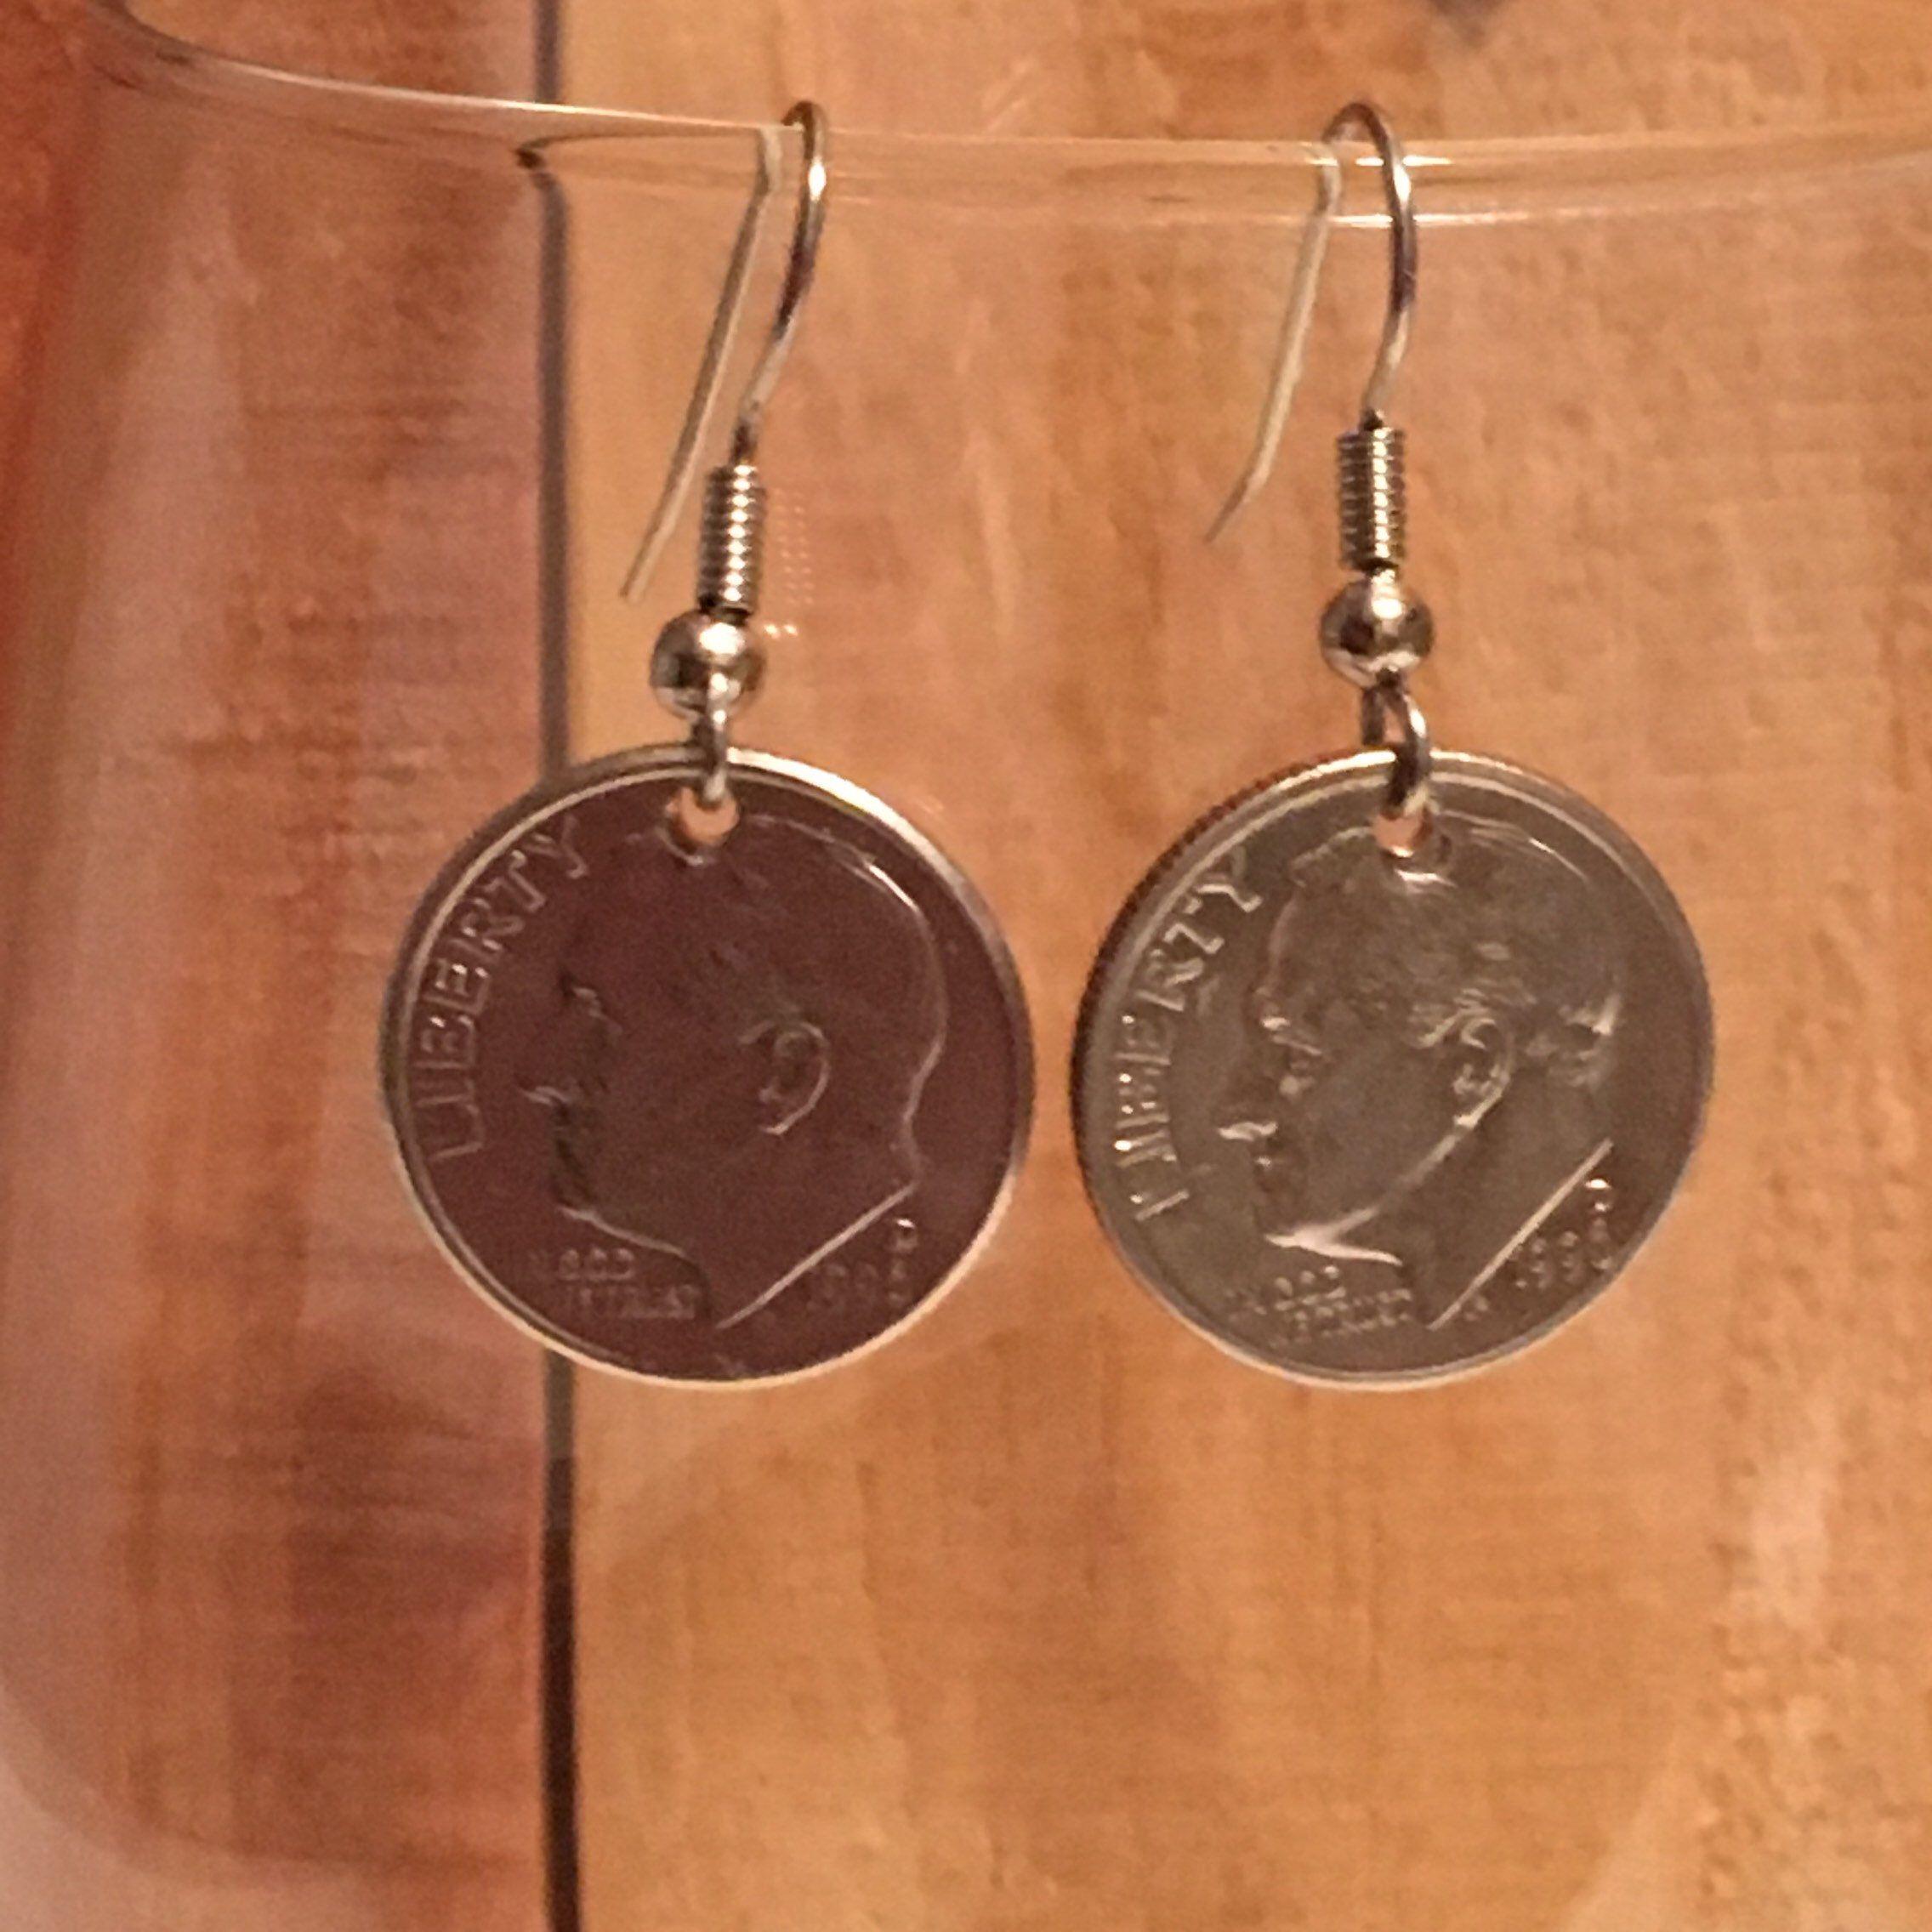 1996 dime earrings free gift bag 23 year anniversary 23rd